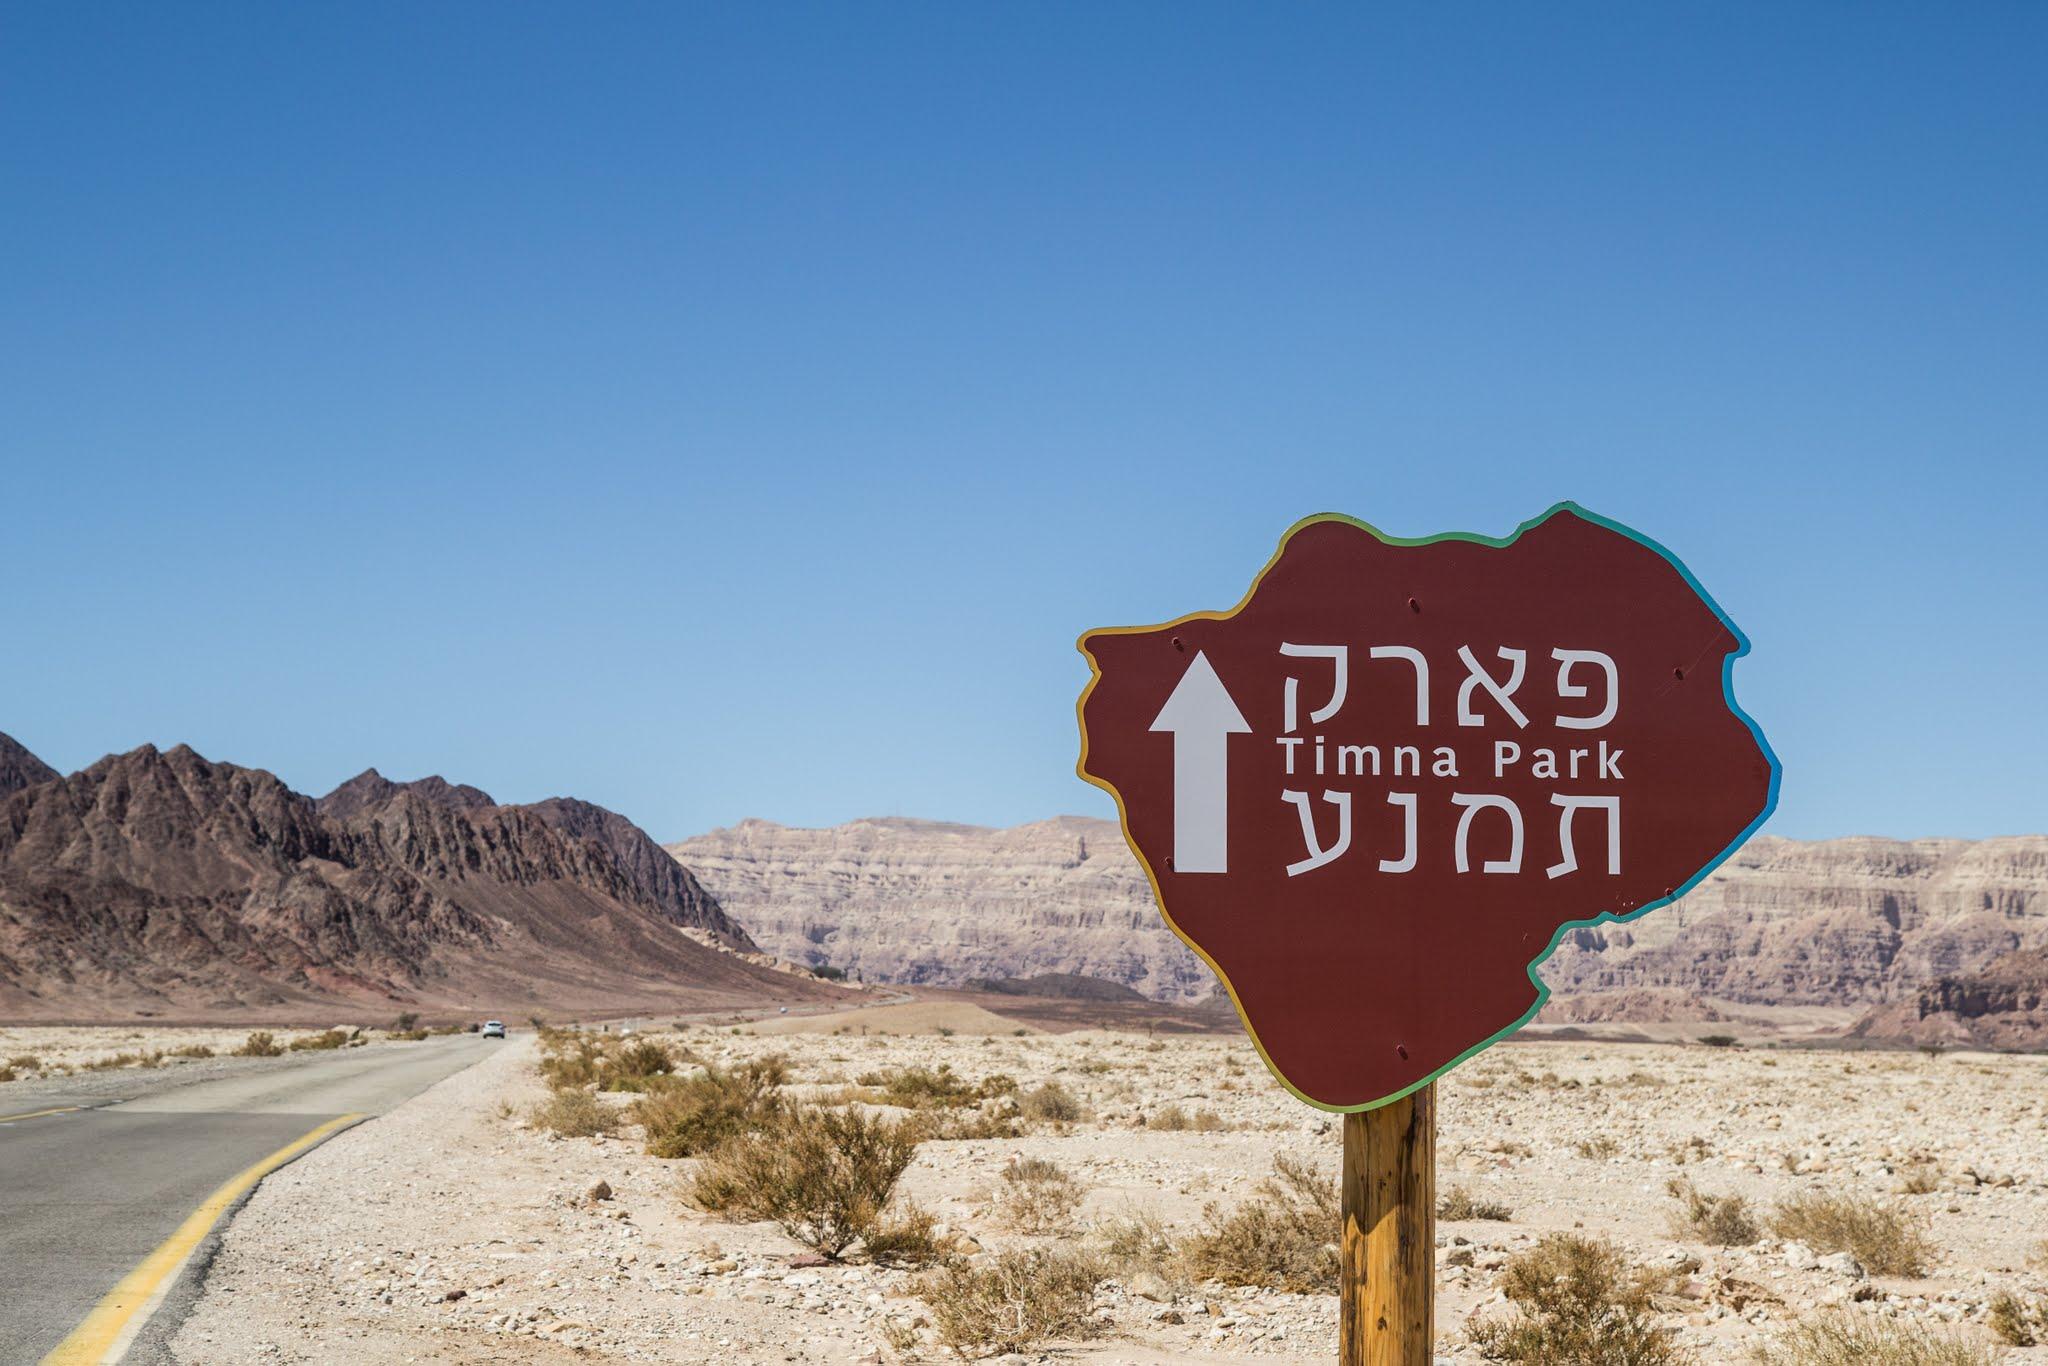 Timna Park, Izrael z dziećmi, atrakcje